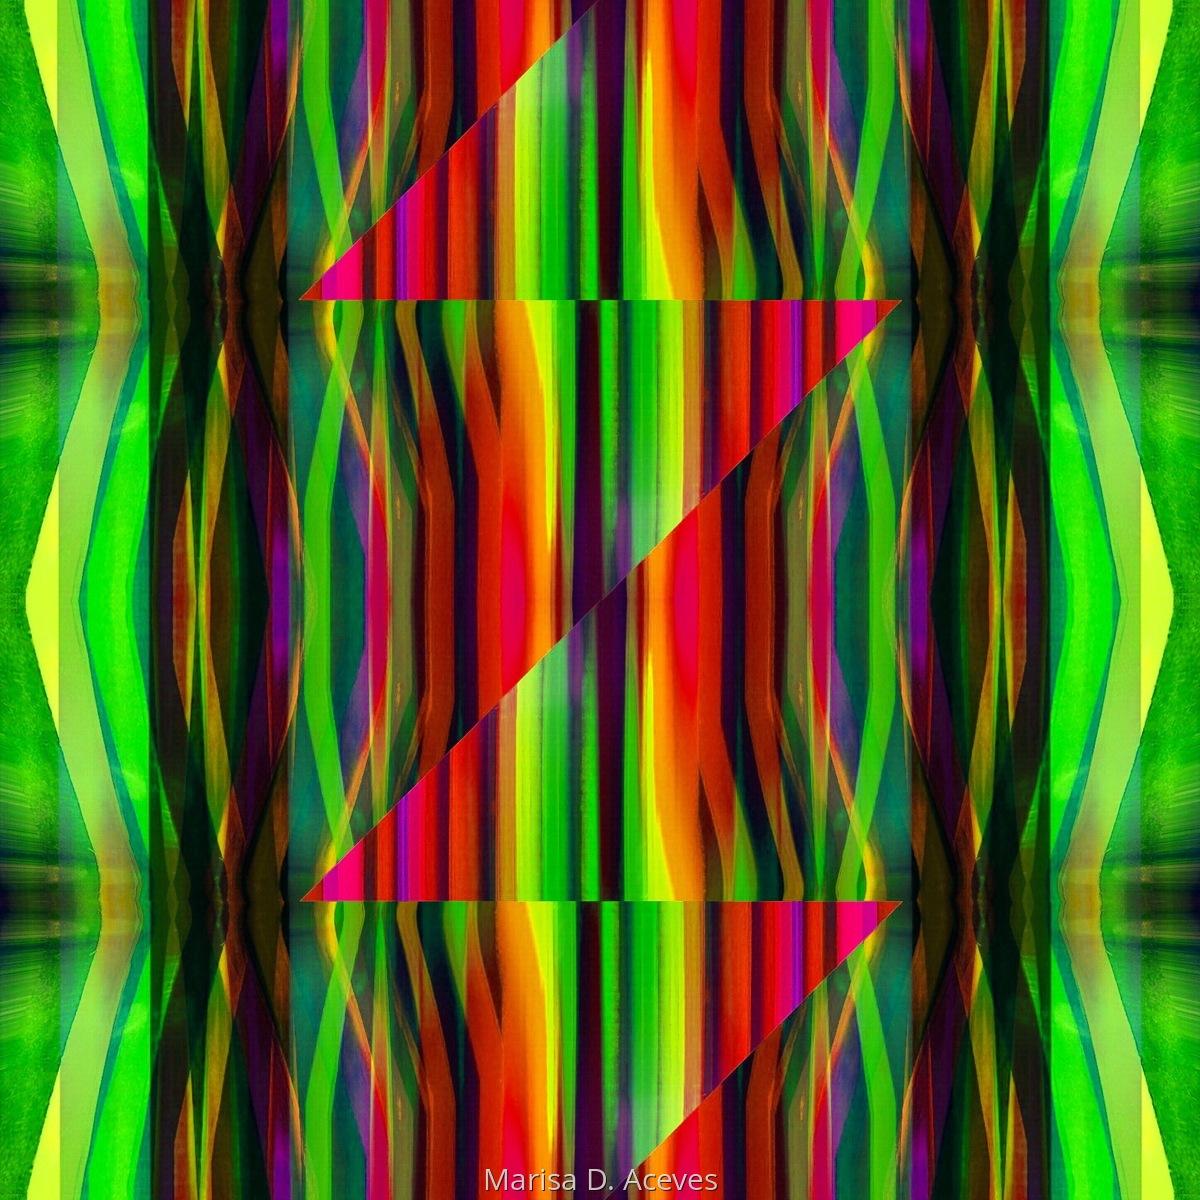 Spectrum 3 Z (large view)